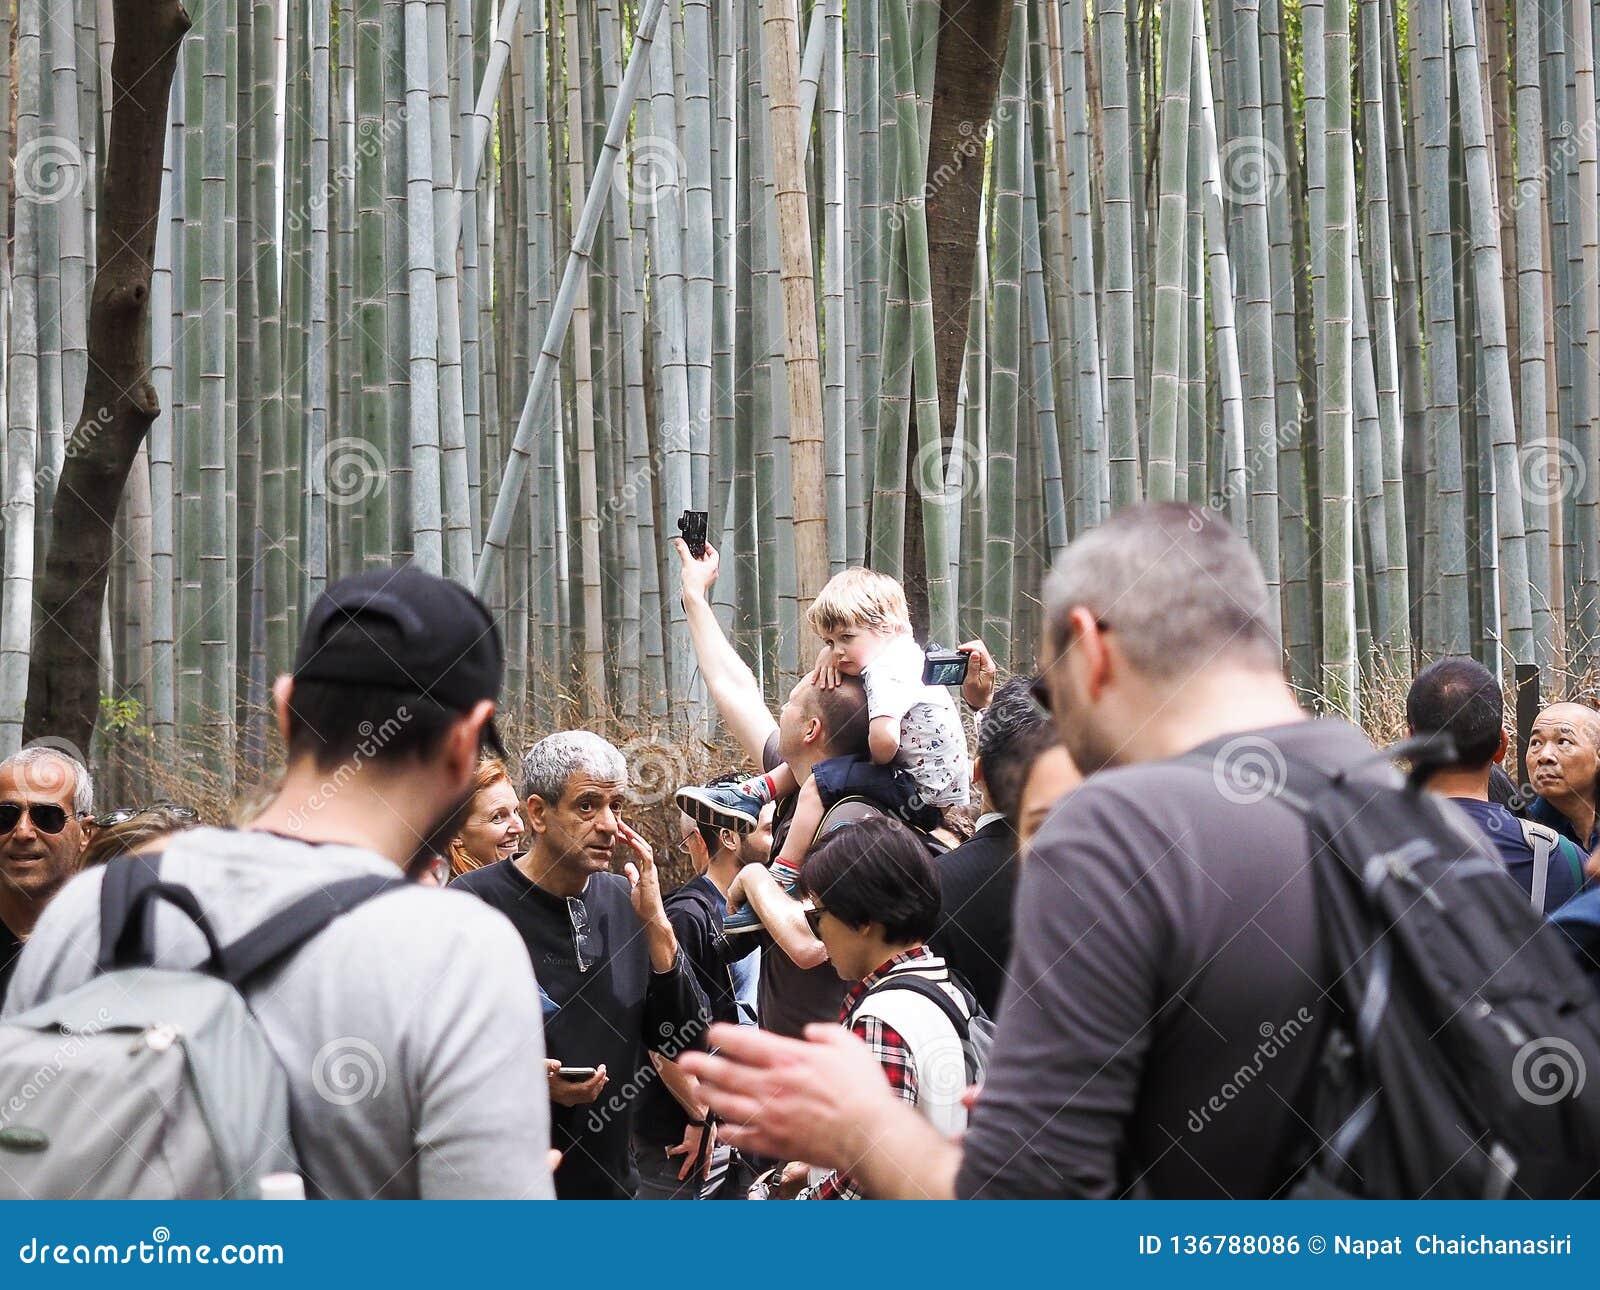 Arashiyama /kyoto, Japan - April 12, 2018 : Chikurin-no-Michi Bamboo Grove and group of tourism